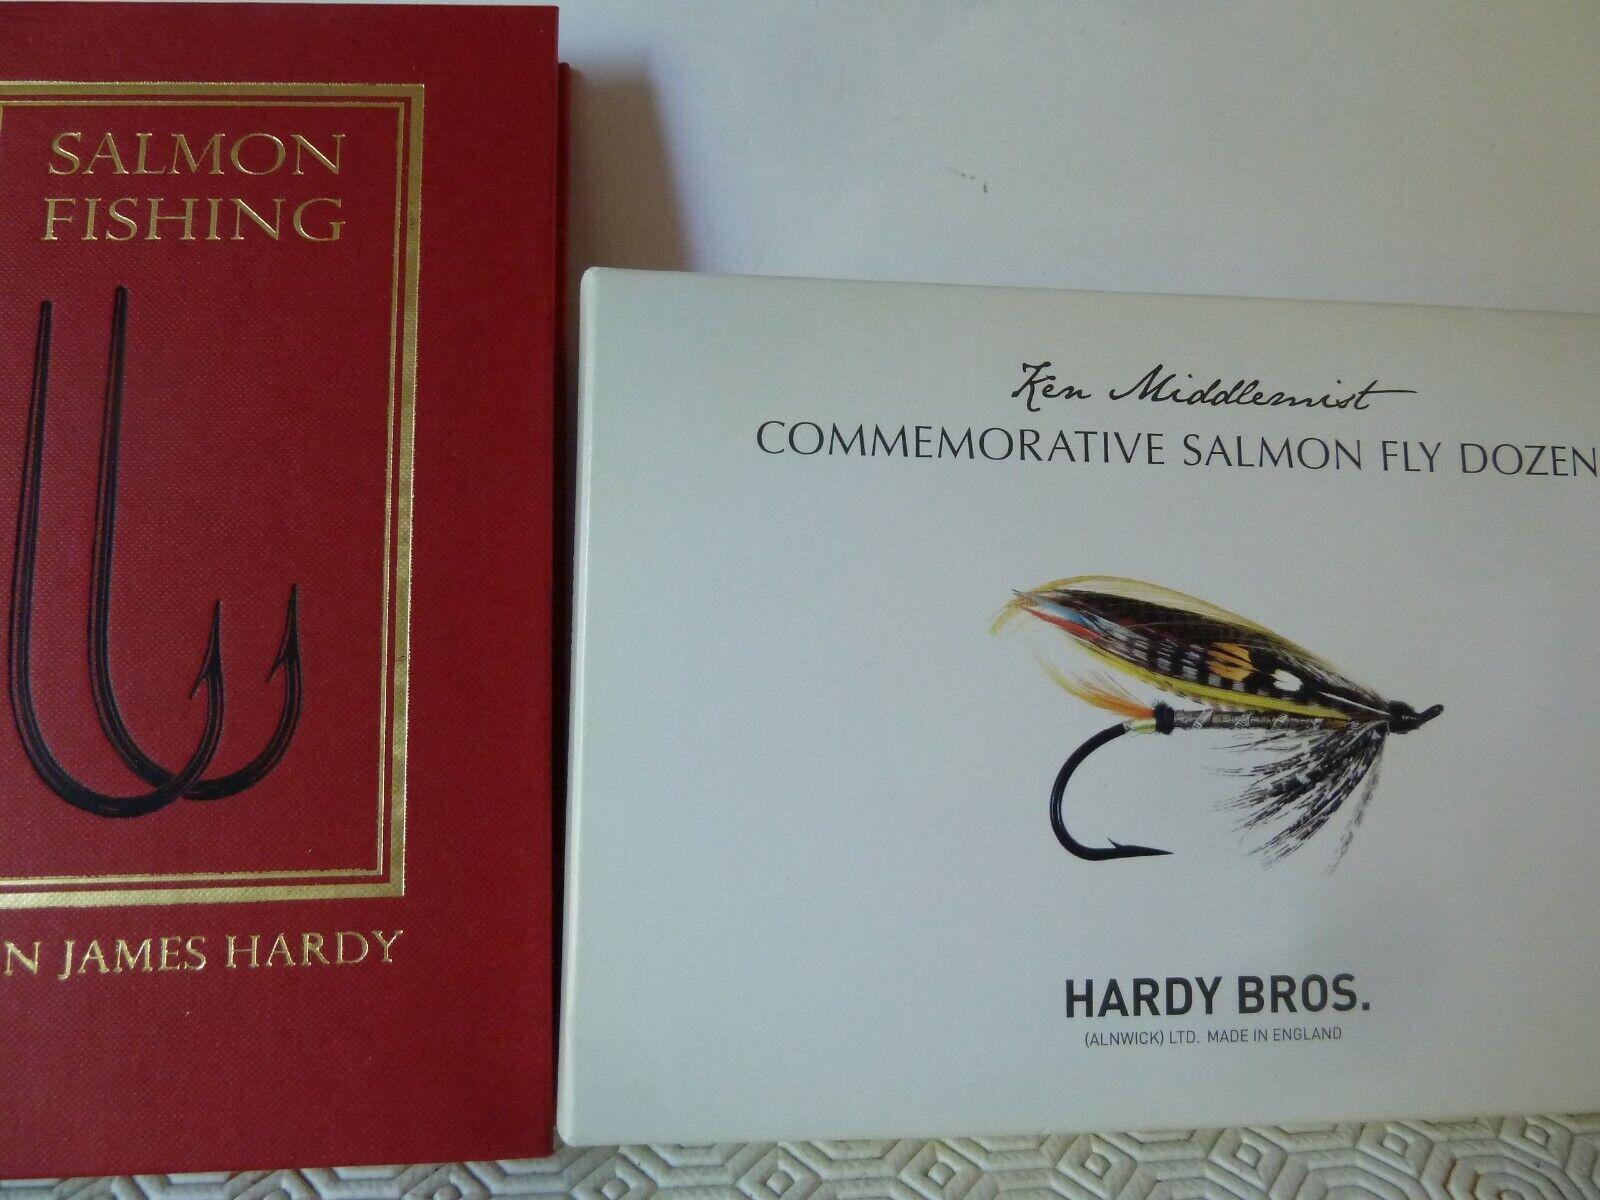 Hardy Bros Ken Middlemist Commemorative Salmon Fly Dozen - Limited Edition No.41